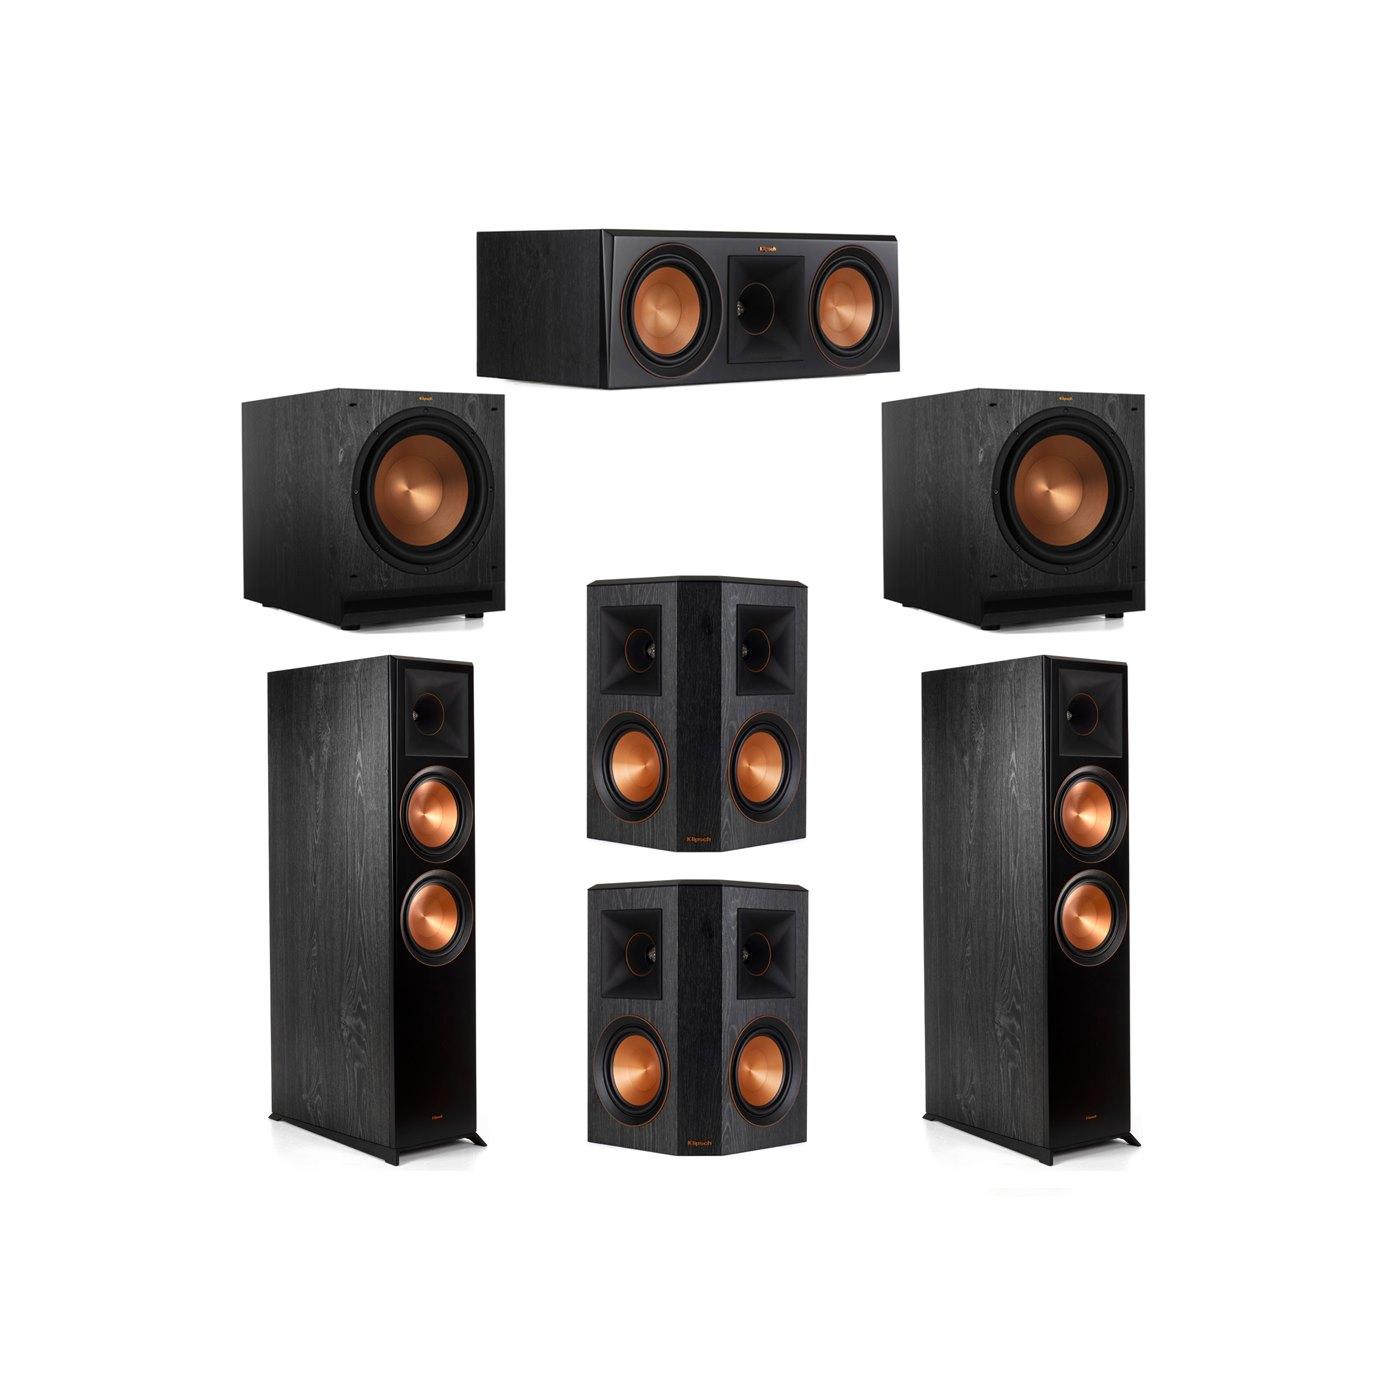 Klipsch 5.2 System with 2 RP-8000F Floorstanding Speakers, 1 Klipsch RP-600C Center Speaker, 2 Klipsch RP-502S Surround Speakers, 2 Klipsch SPL-120 Subwoofers